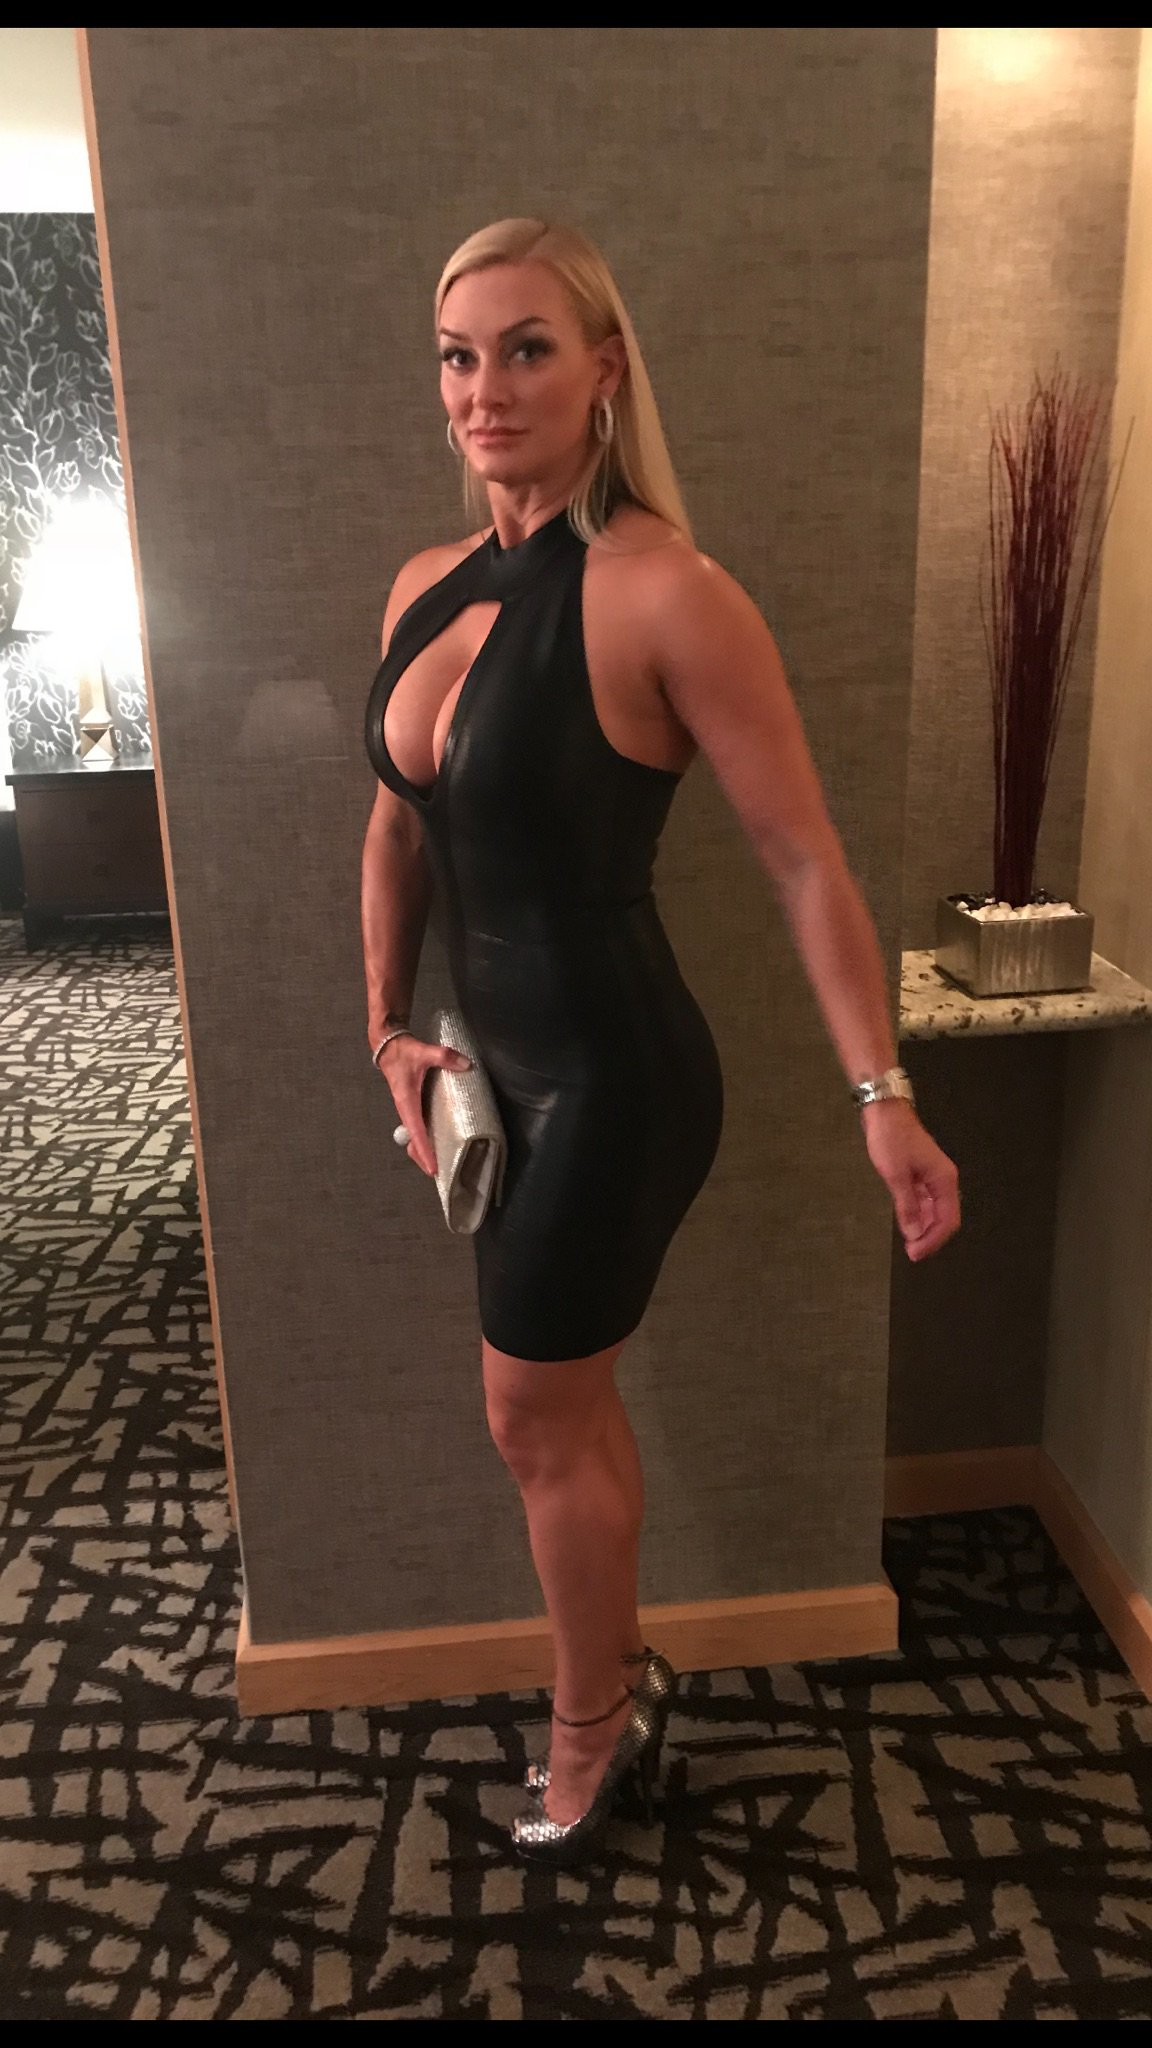 Hulk Hogan On Twitter Happy Birthday To The Love Of My Life I Love You Jennifer Hh